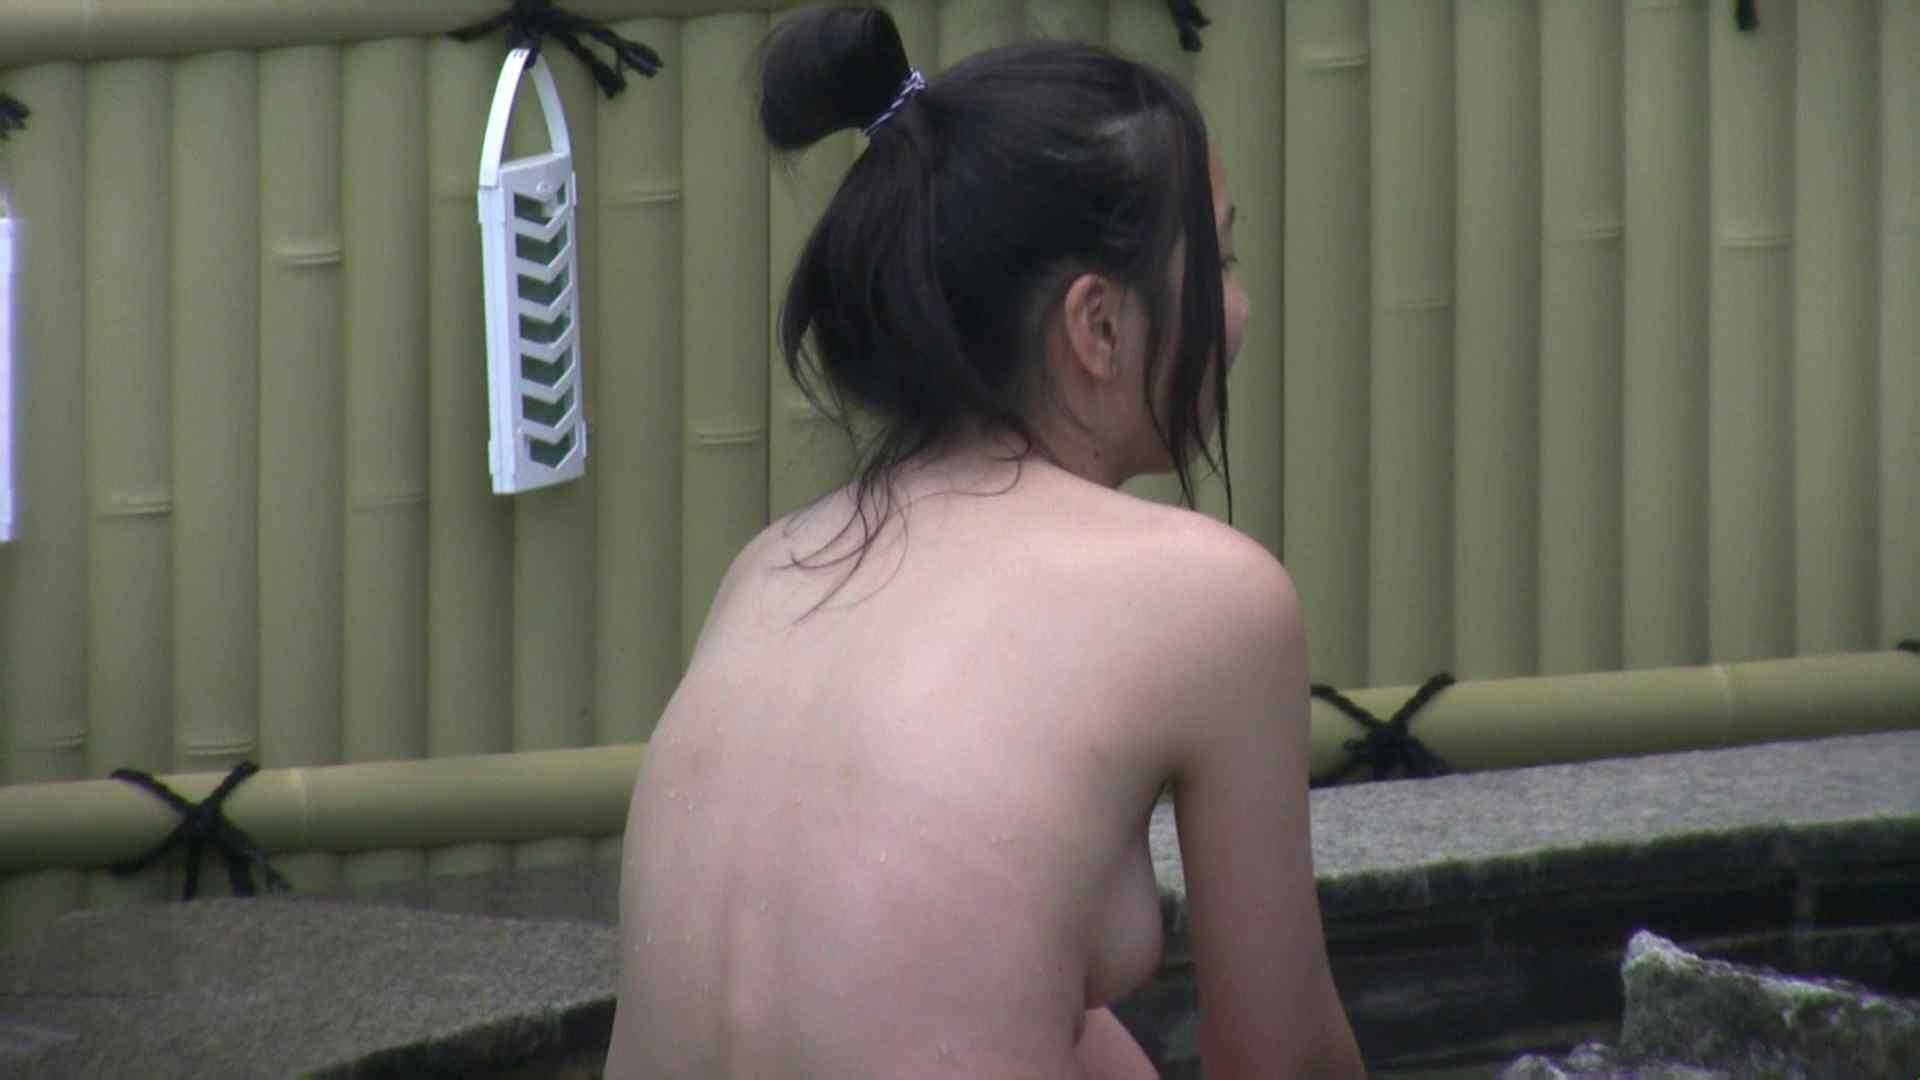 Aquaな露天風呂Vol.87【VIP限定】 盗撮 SEX無修正画像 92画像 92